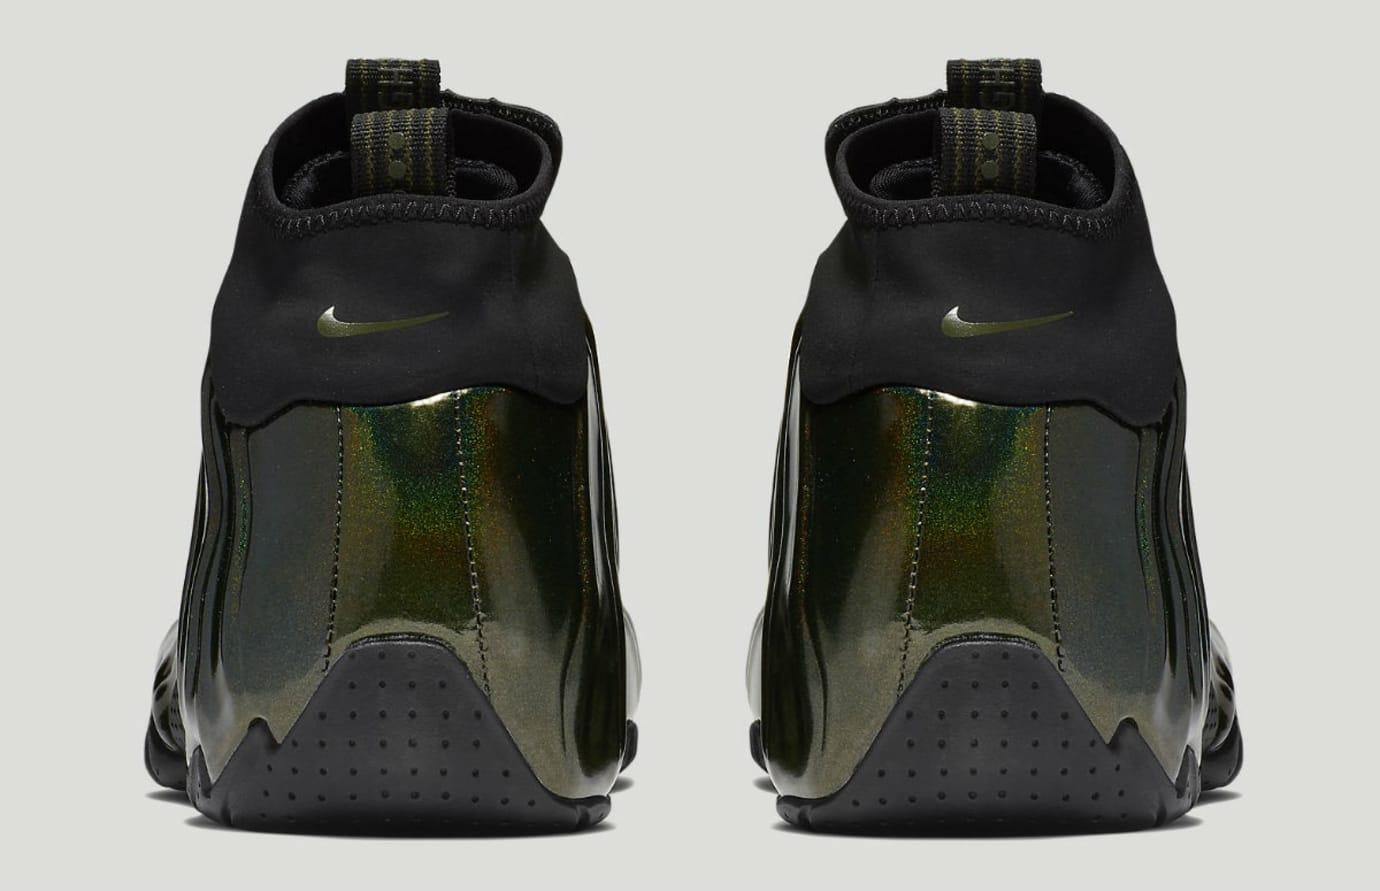 668b4a2065 Image via Nike Nike Air Flightposite Legion Green Release Date AO9378-300  Heel